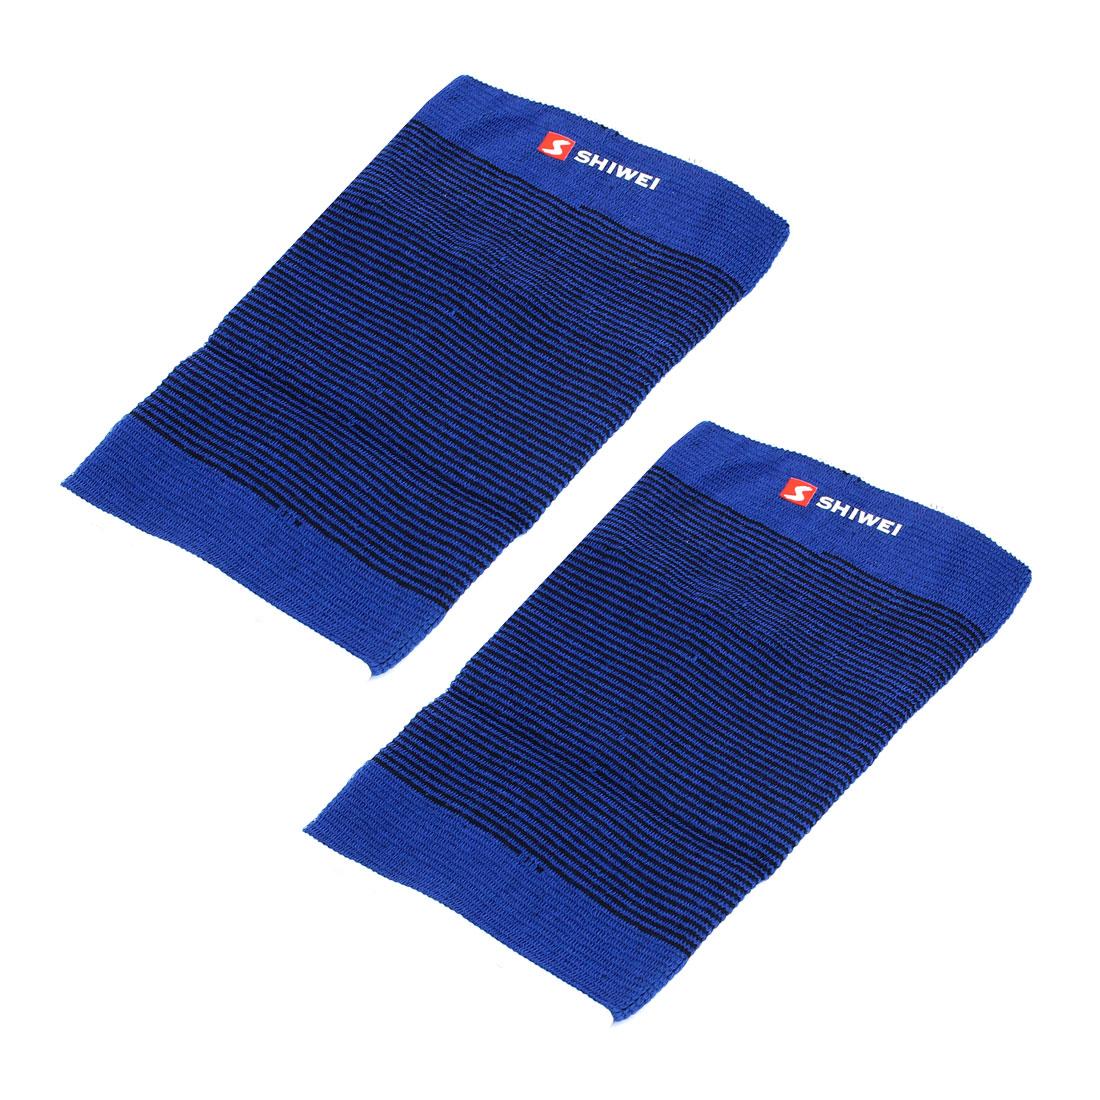 Sports Black Blue Stripe Elastic Knee Support Fastener Wrap Sleeve Guard Protector Pair